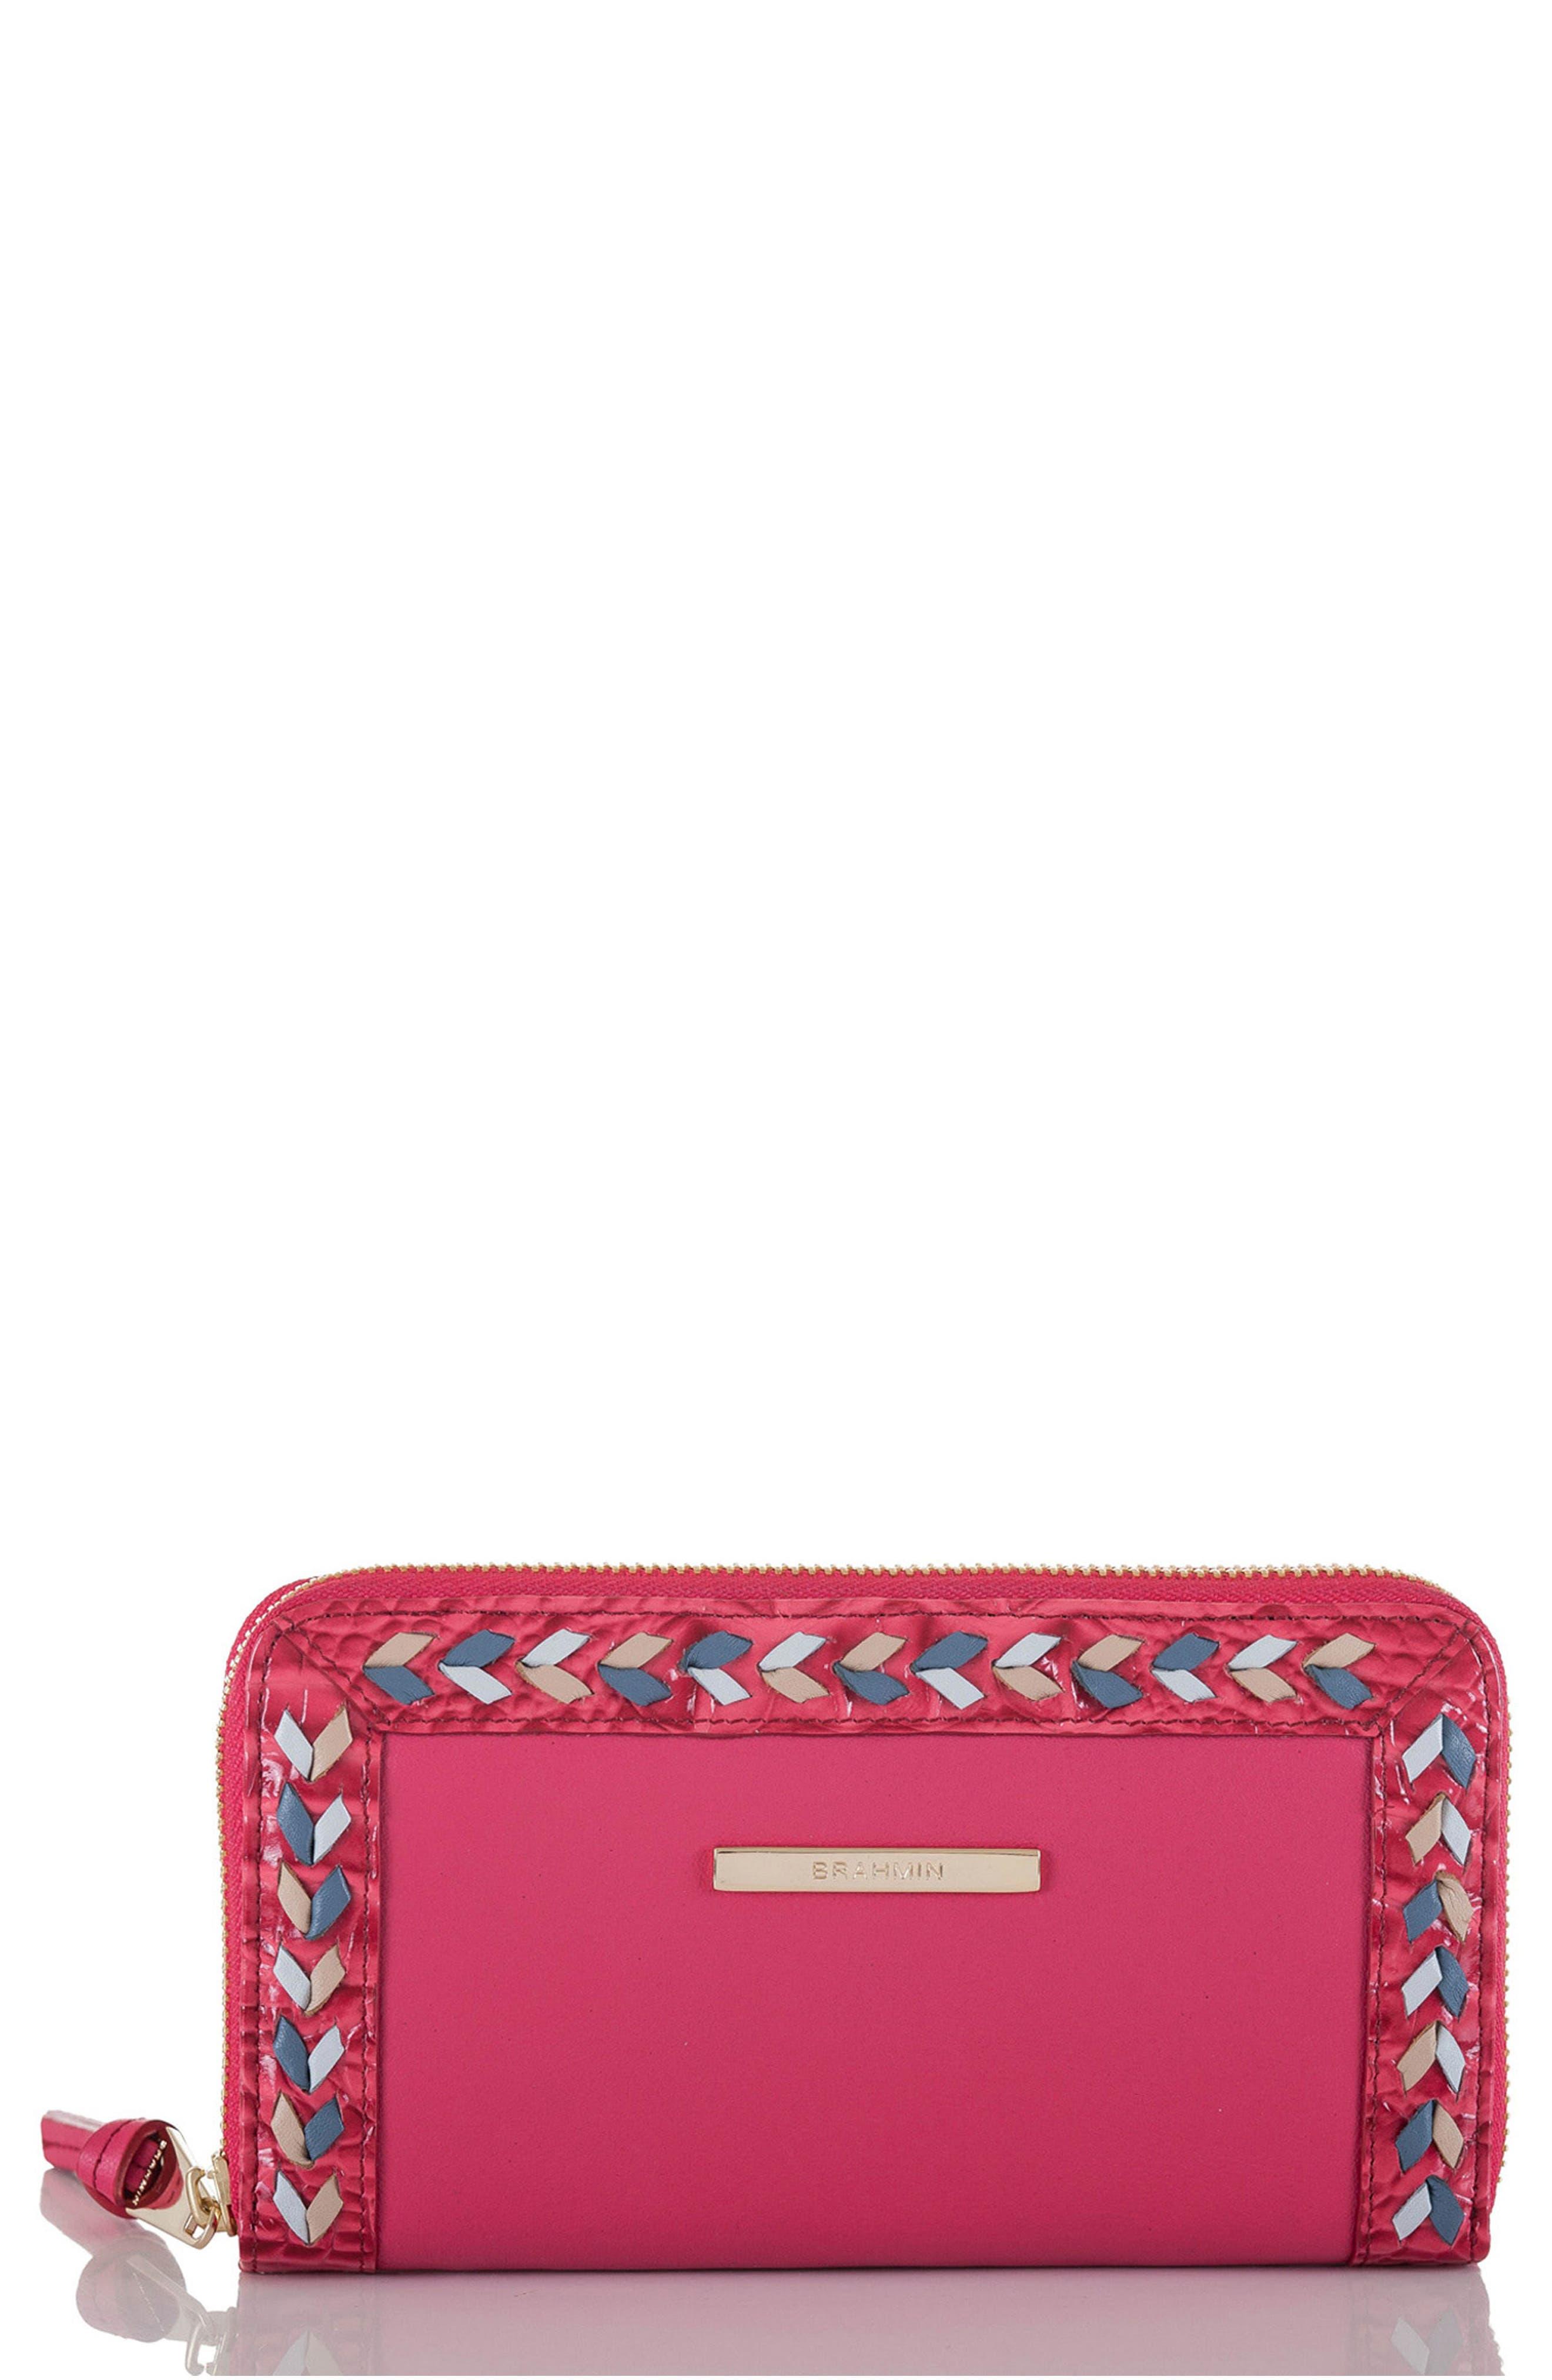 Suri Leather Zip Around Wallet,                         Main,                         color, Ribbon